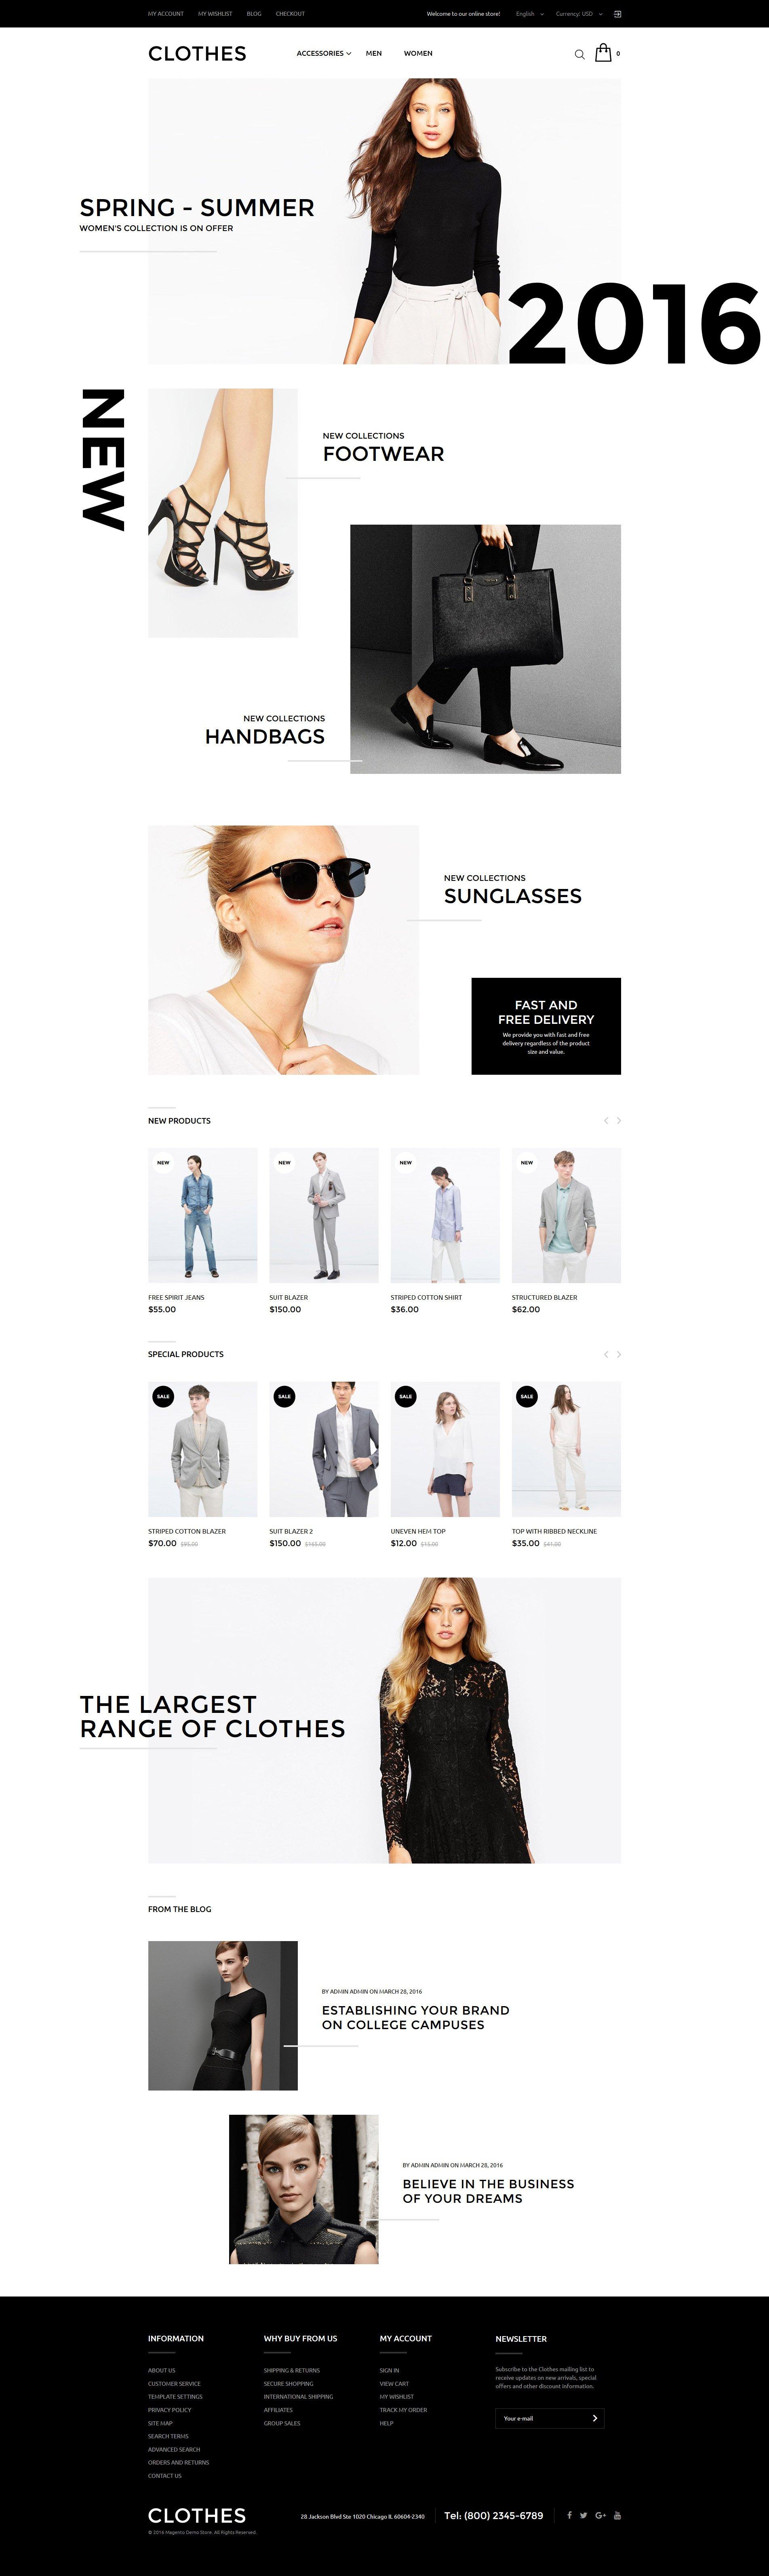 Clothes Store Magento Theme - screenshot